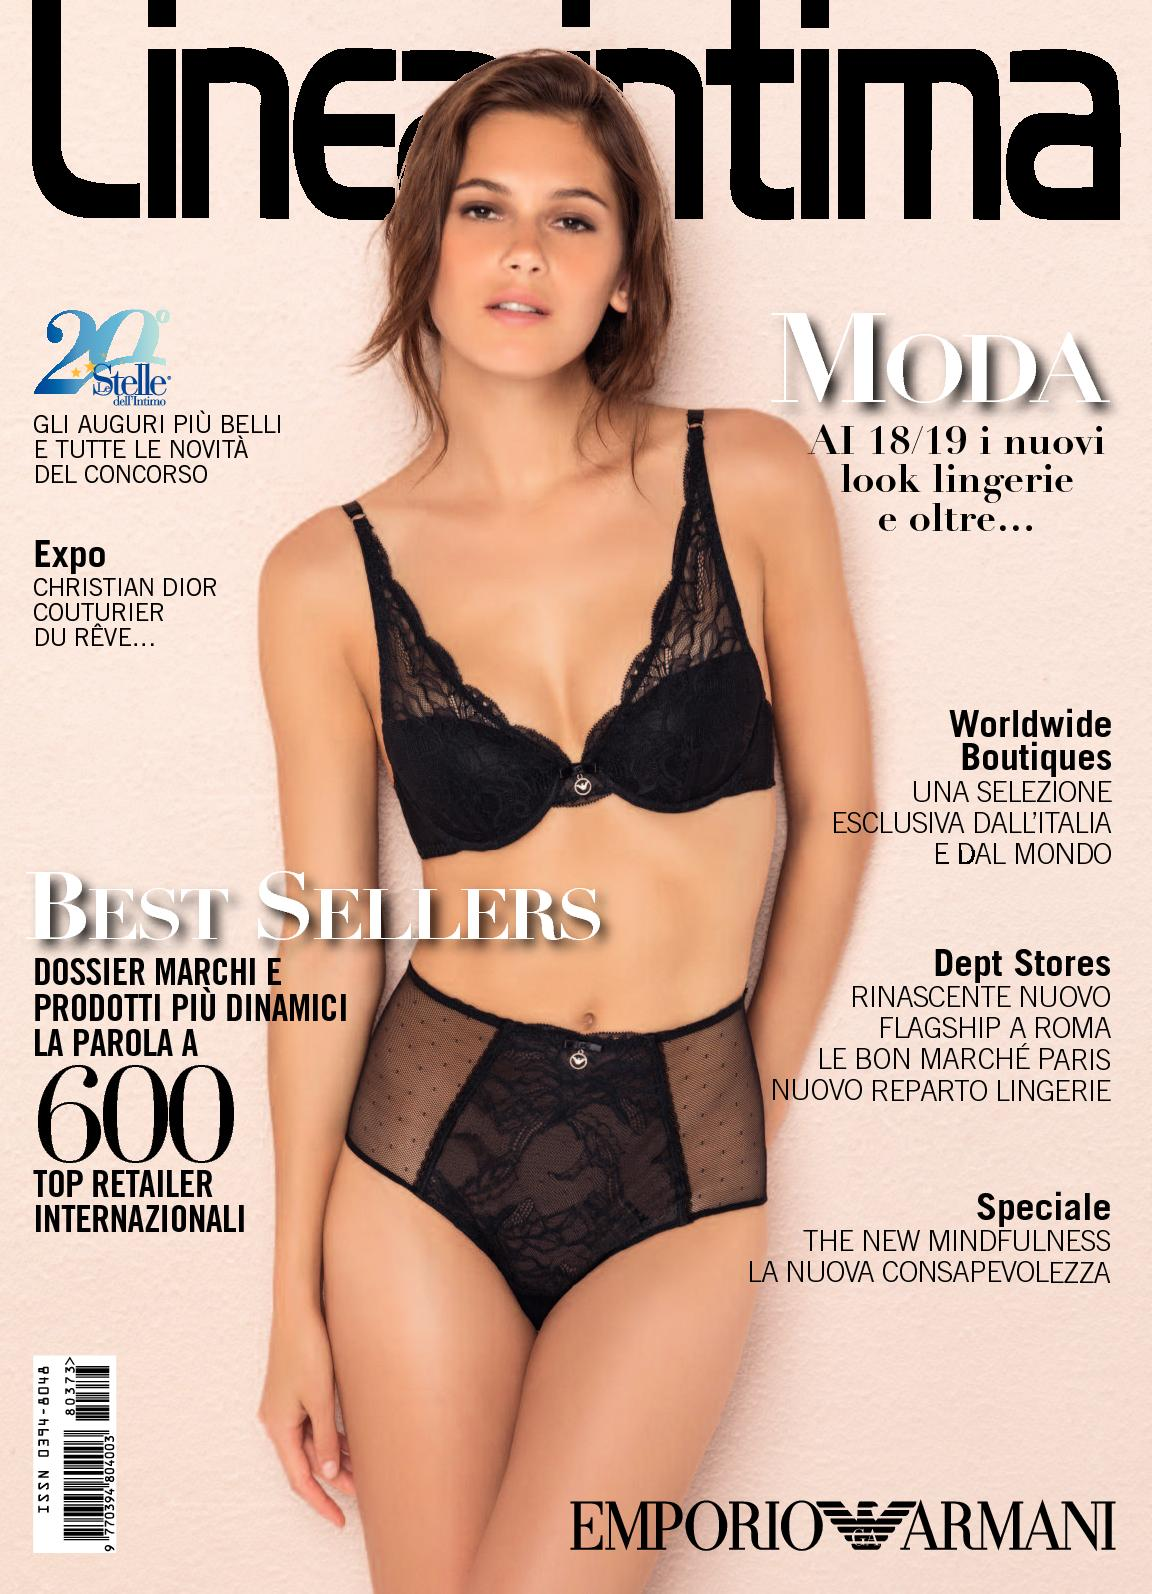 Lora Dora 10 Pack Cotone Ragazzi Underwear Slip